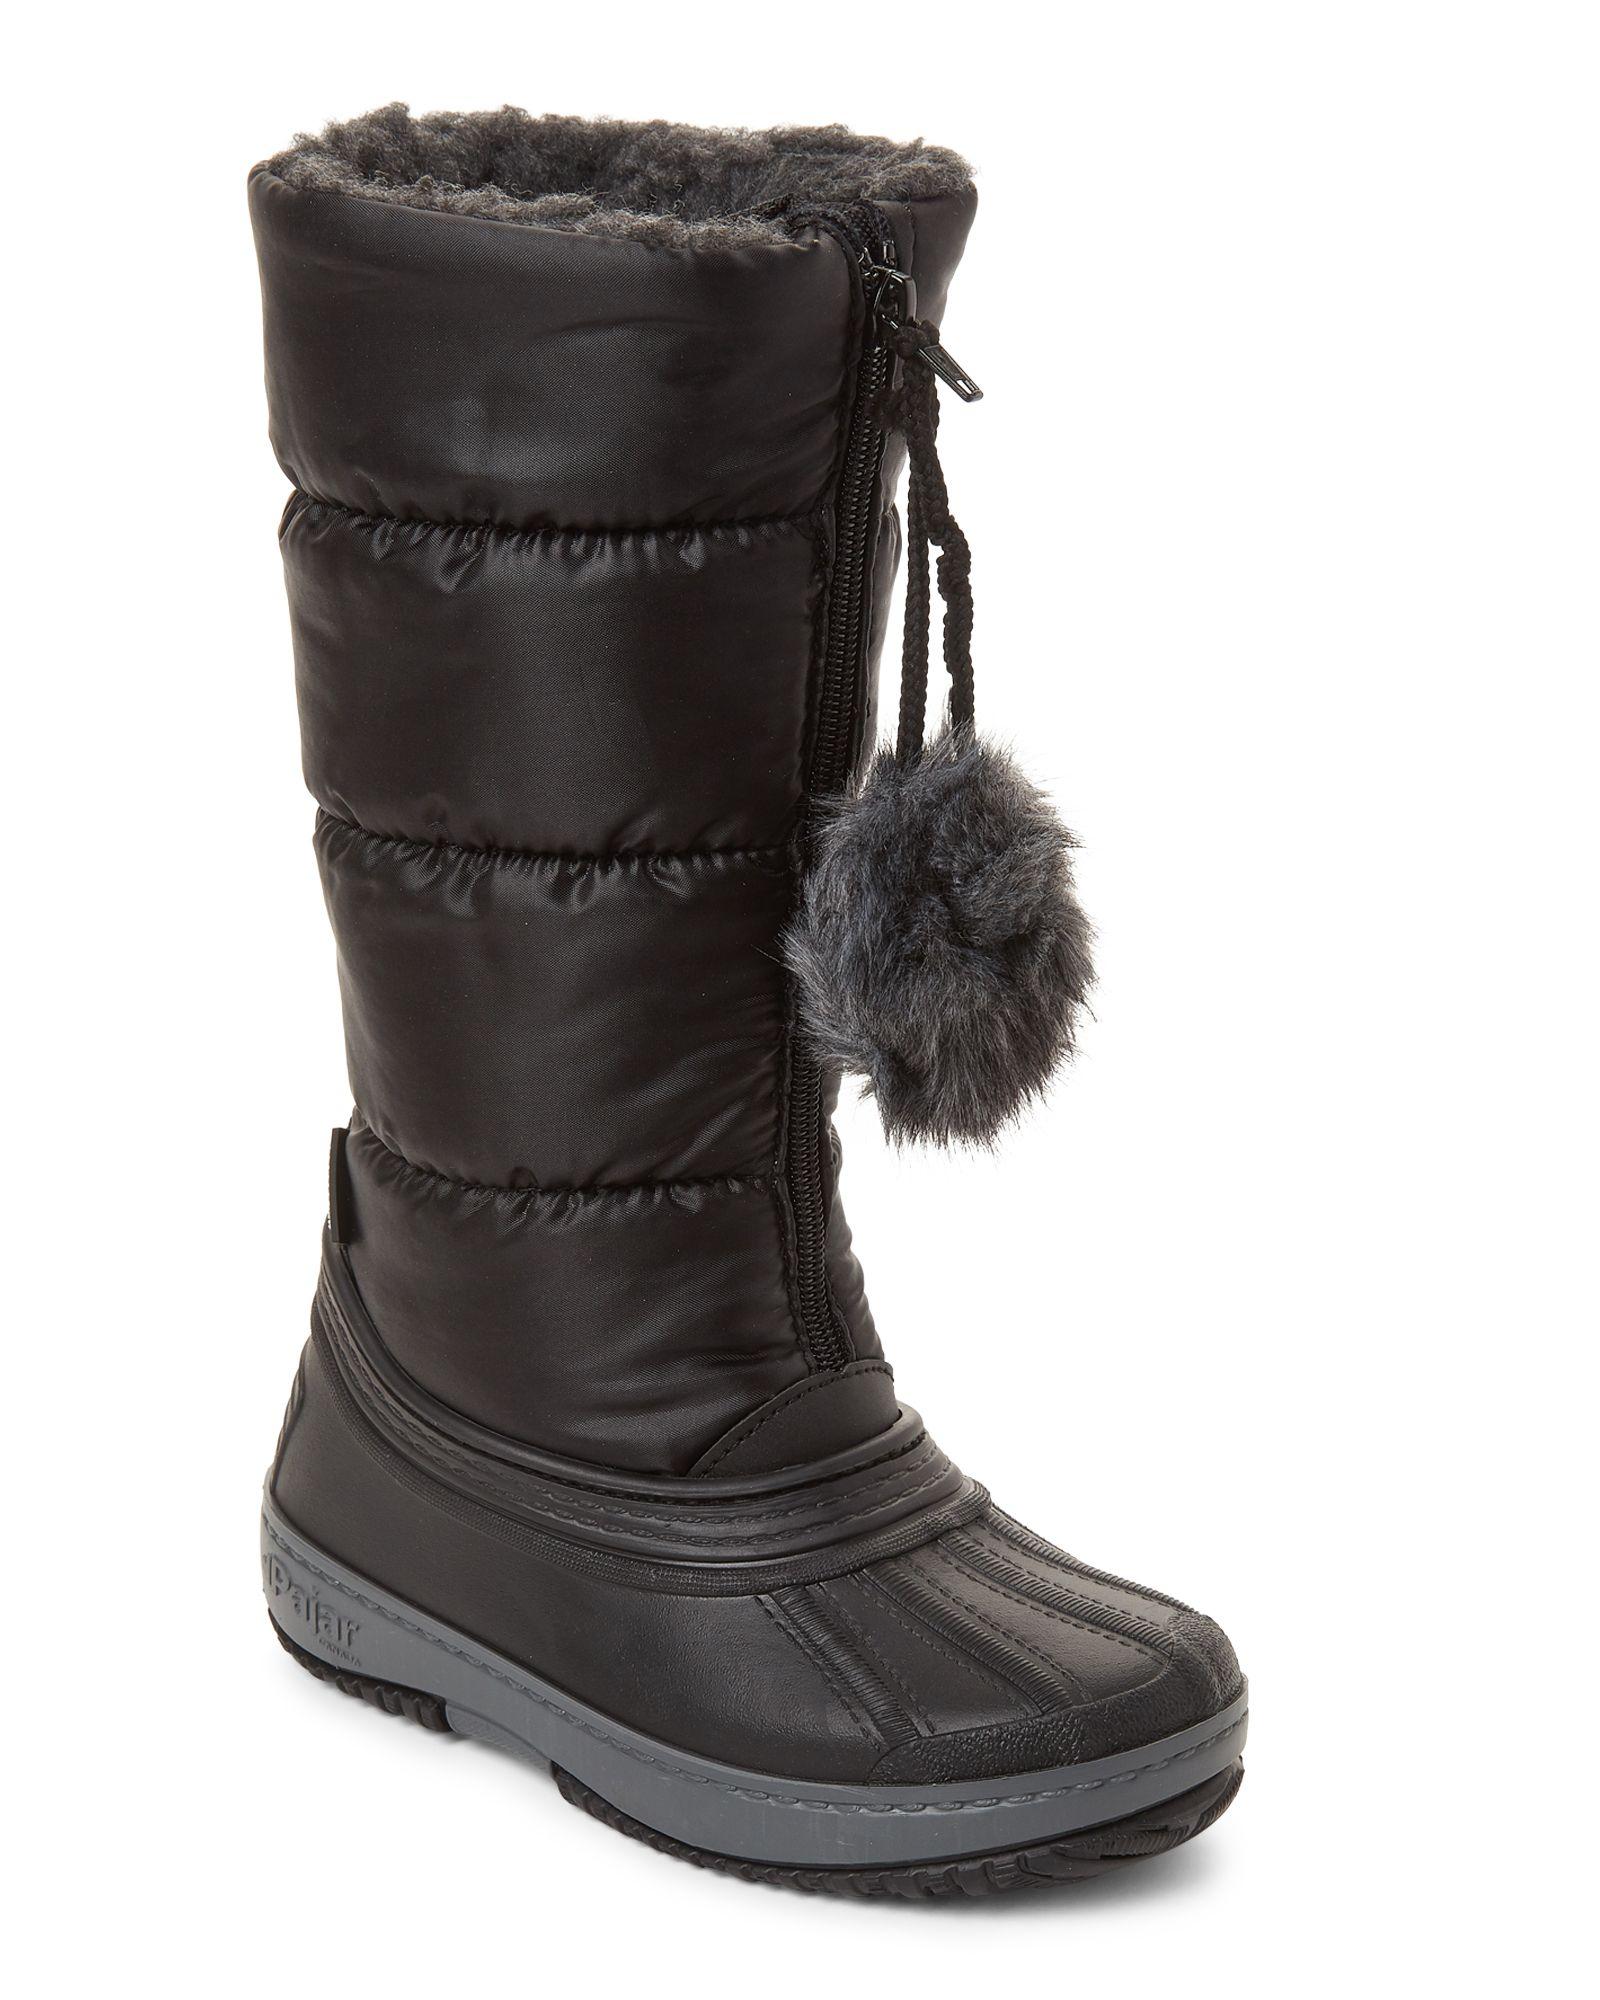 094088ca129 Pajar Canada (Kids Girls) Black Cooper Tall Waterproof Boots ...